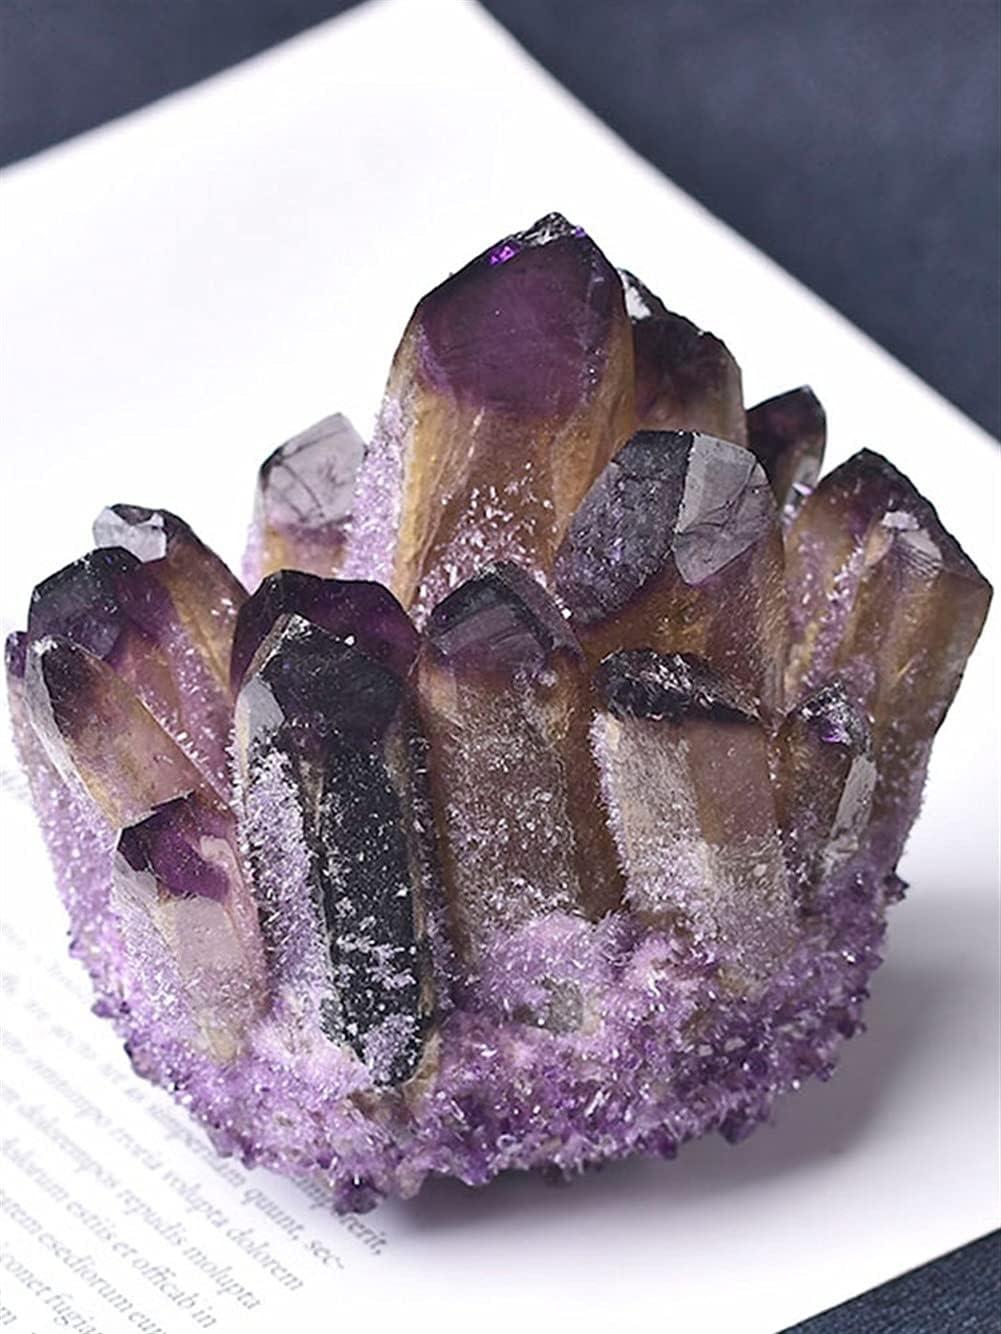 GOSOU Natural San Diego Mall Amethyst Cluster Quartz Purple Crystal Stone Many popular brands Rock